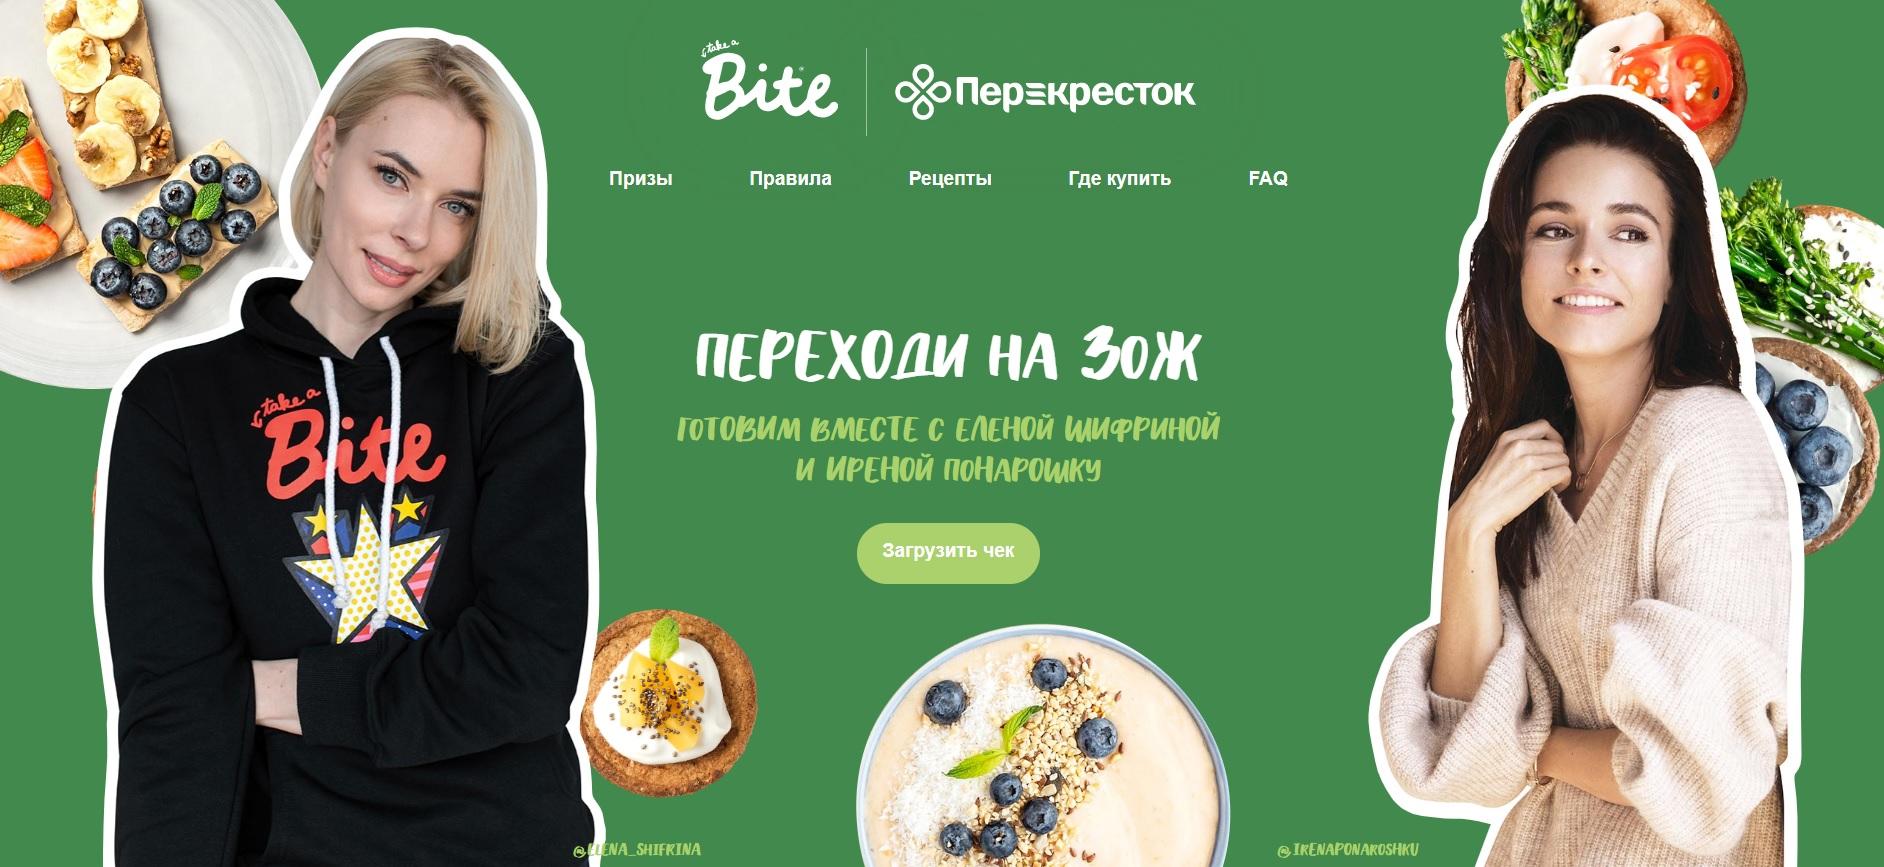 bitekonkurs.ru акция 2020 года